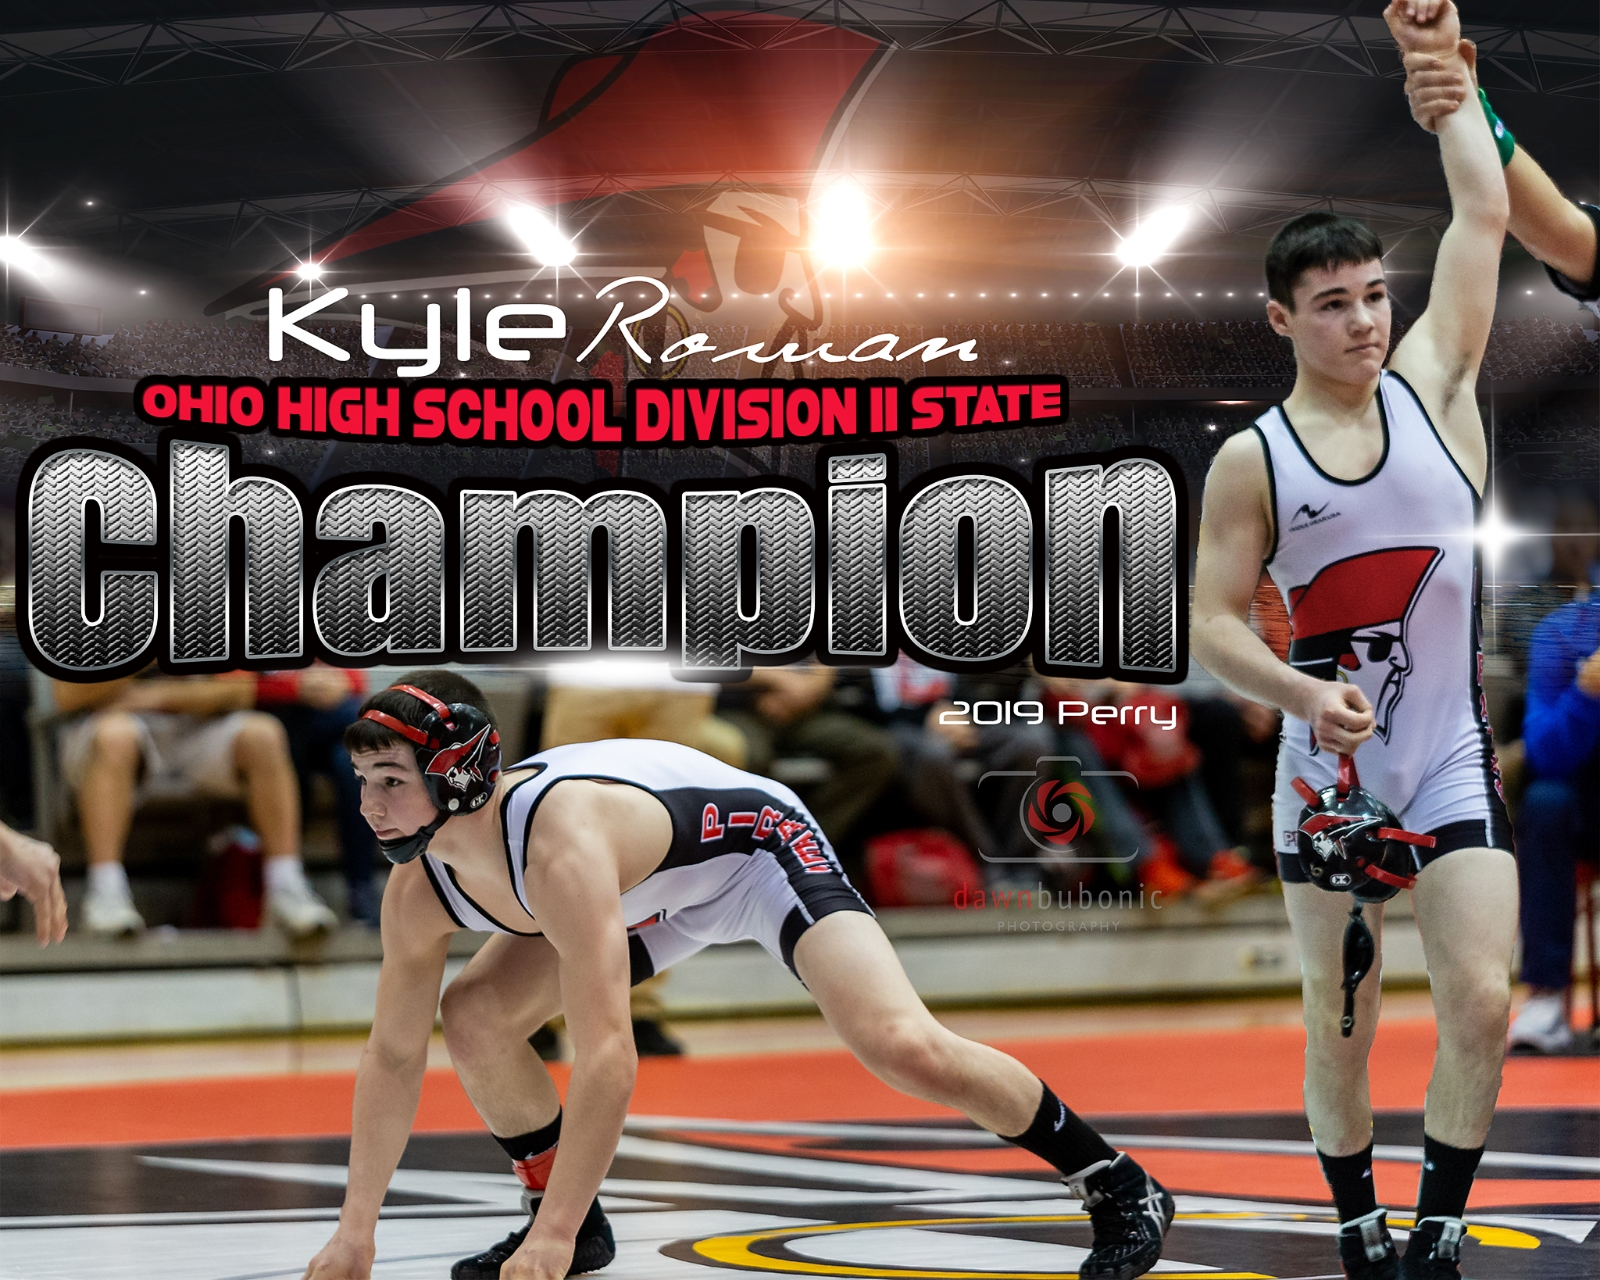 Kyle Rowan 106lb. Div. II State Champion